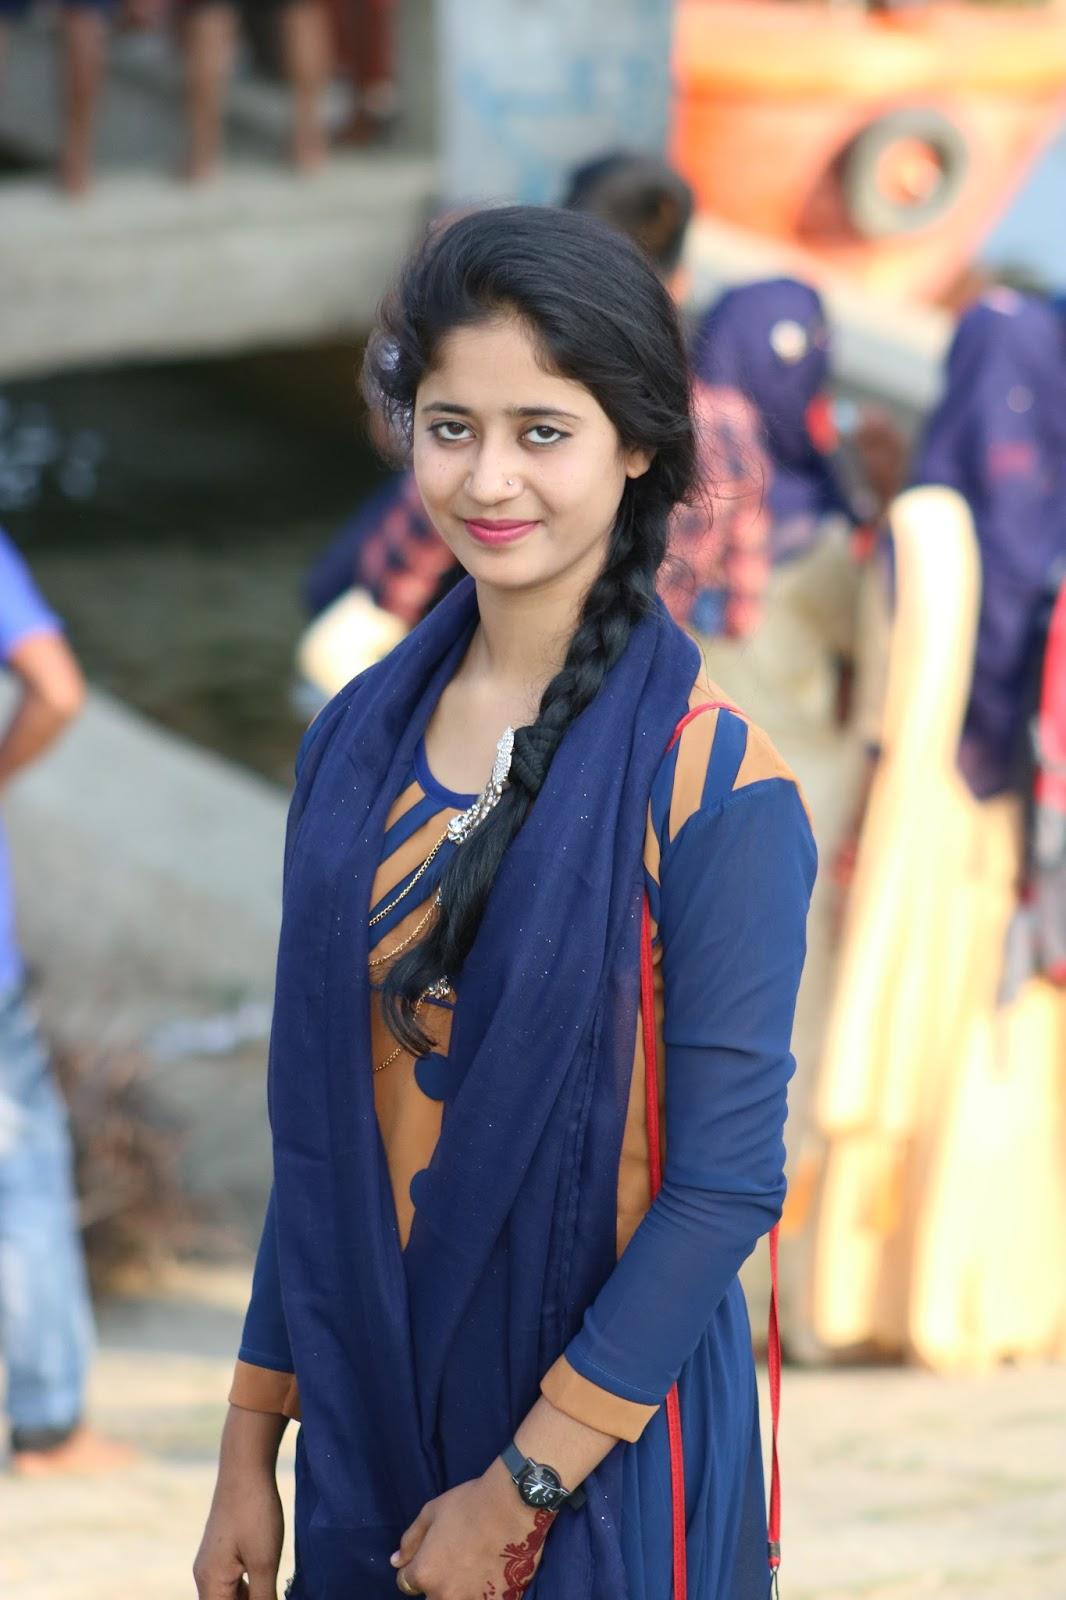 Beautiful Girls Bangladesh In Village - Beautyful Girls -5665